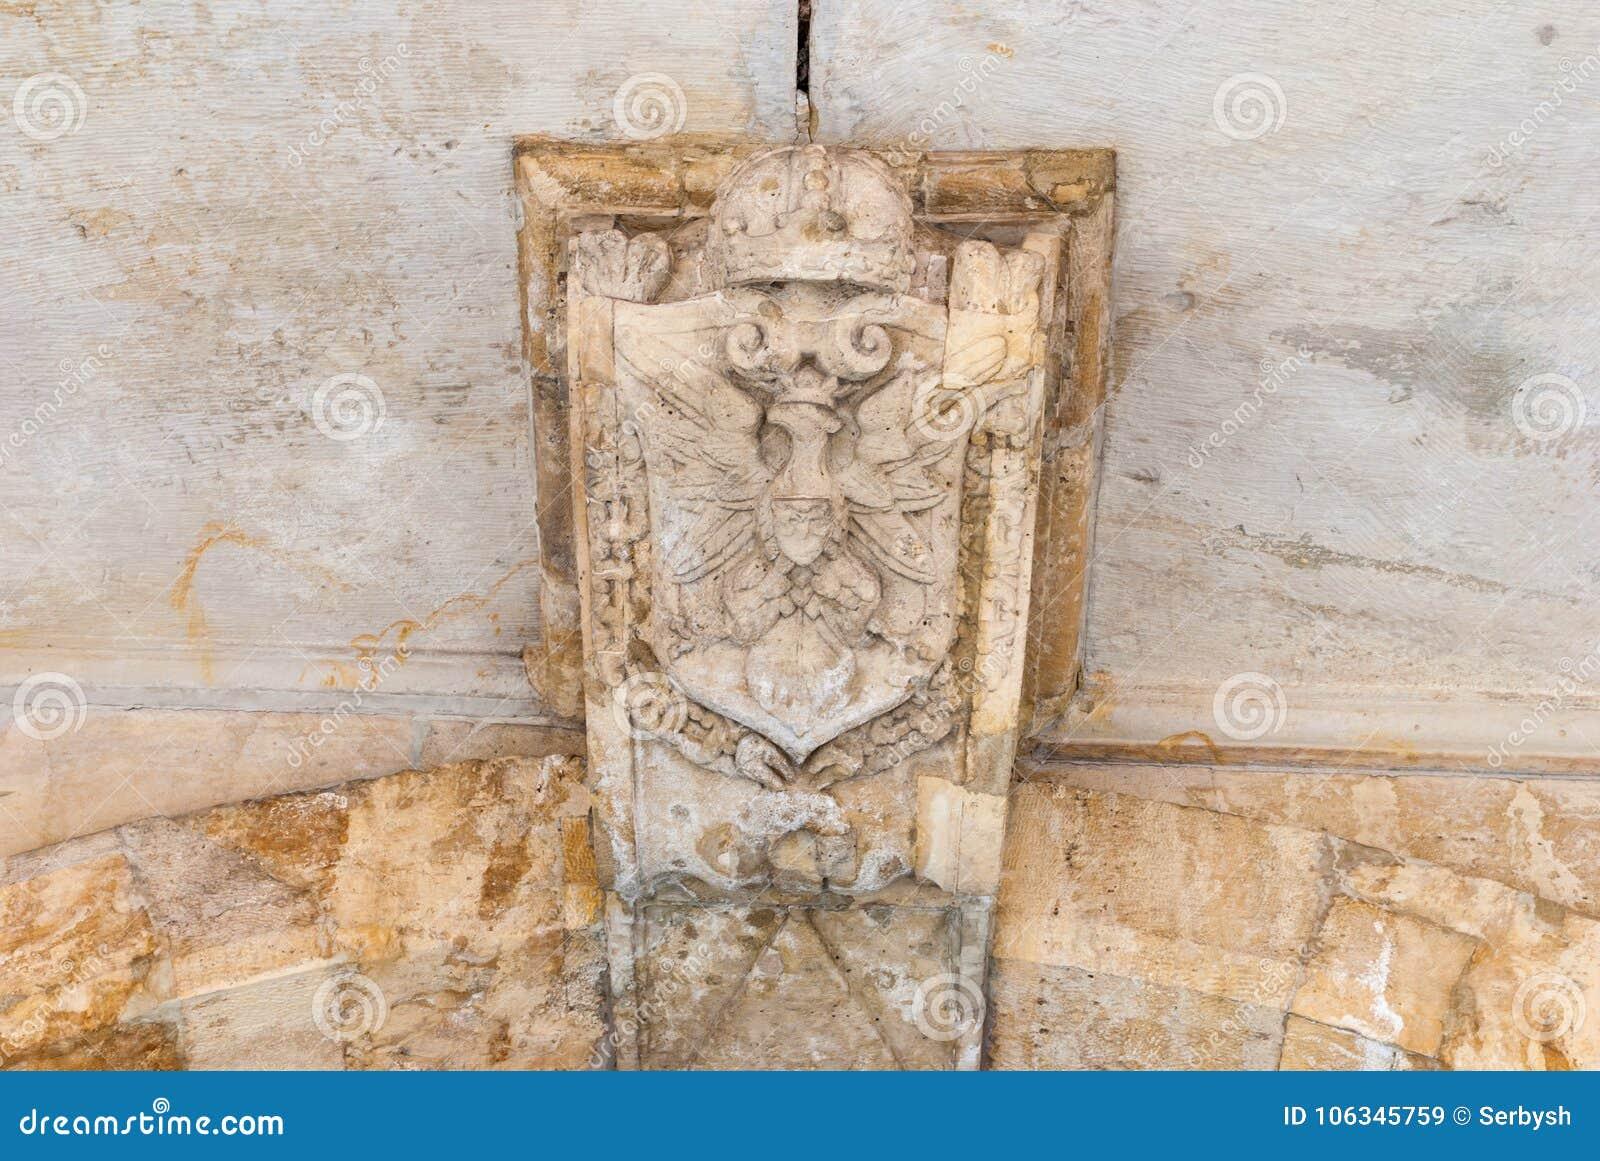 Old polish eagle. National symbol on the stone wall